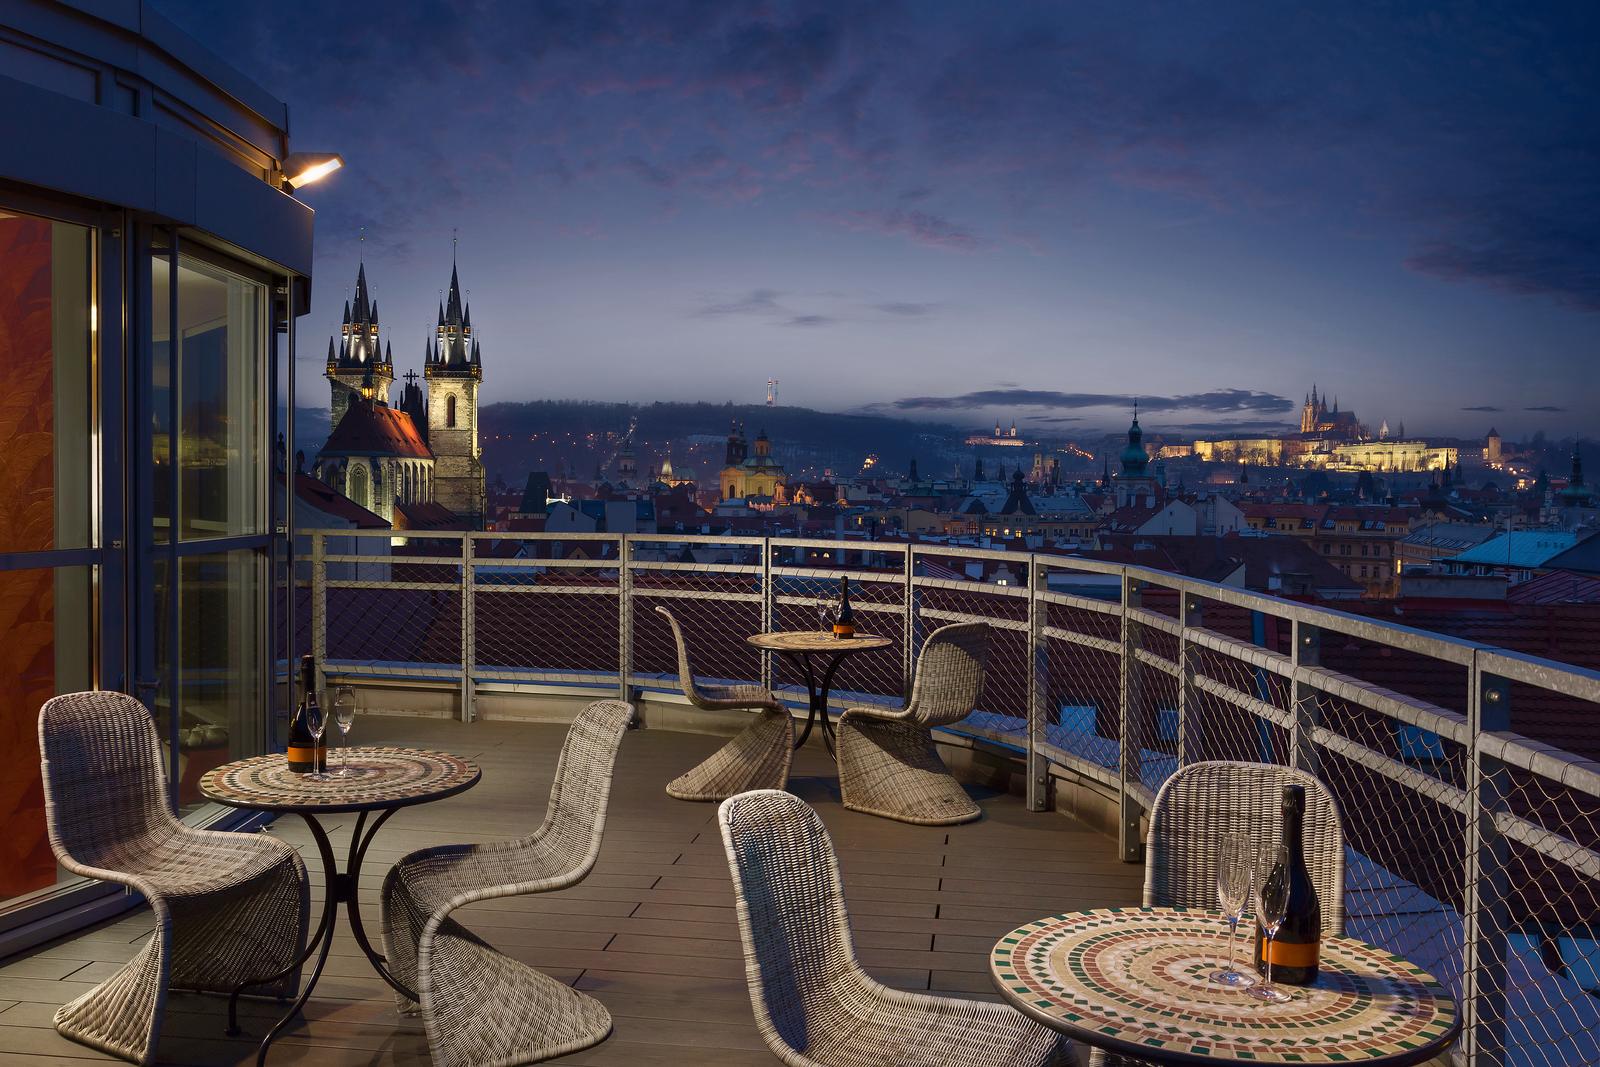 prague_astoria_terrace_view.jpg